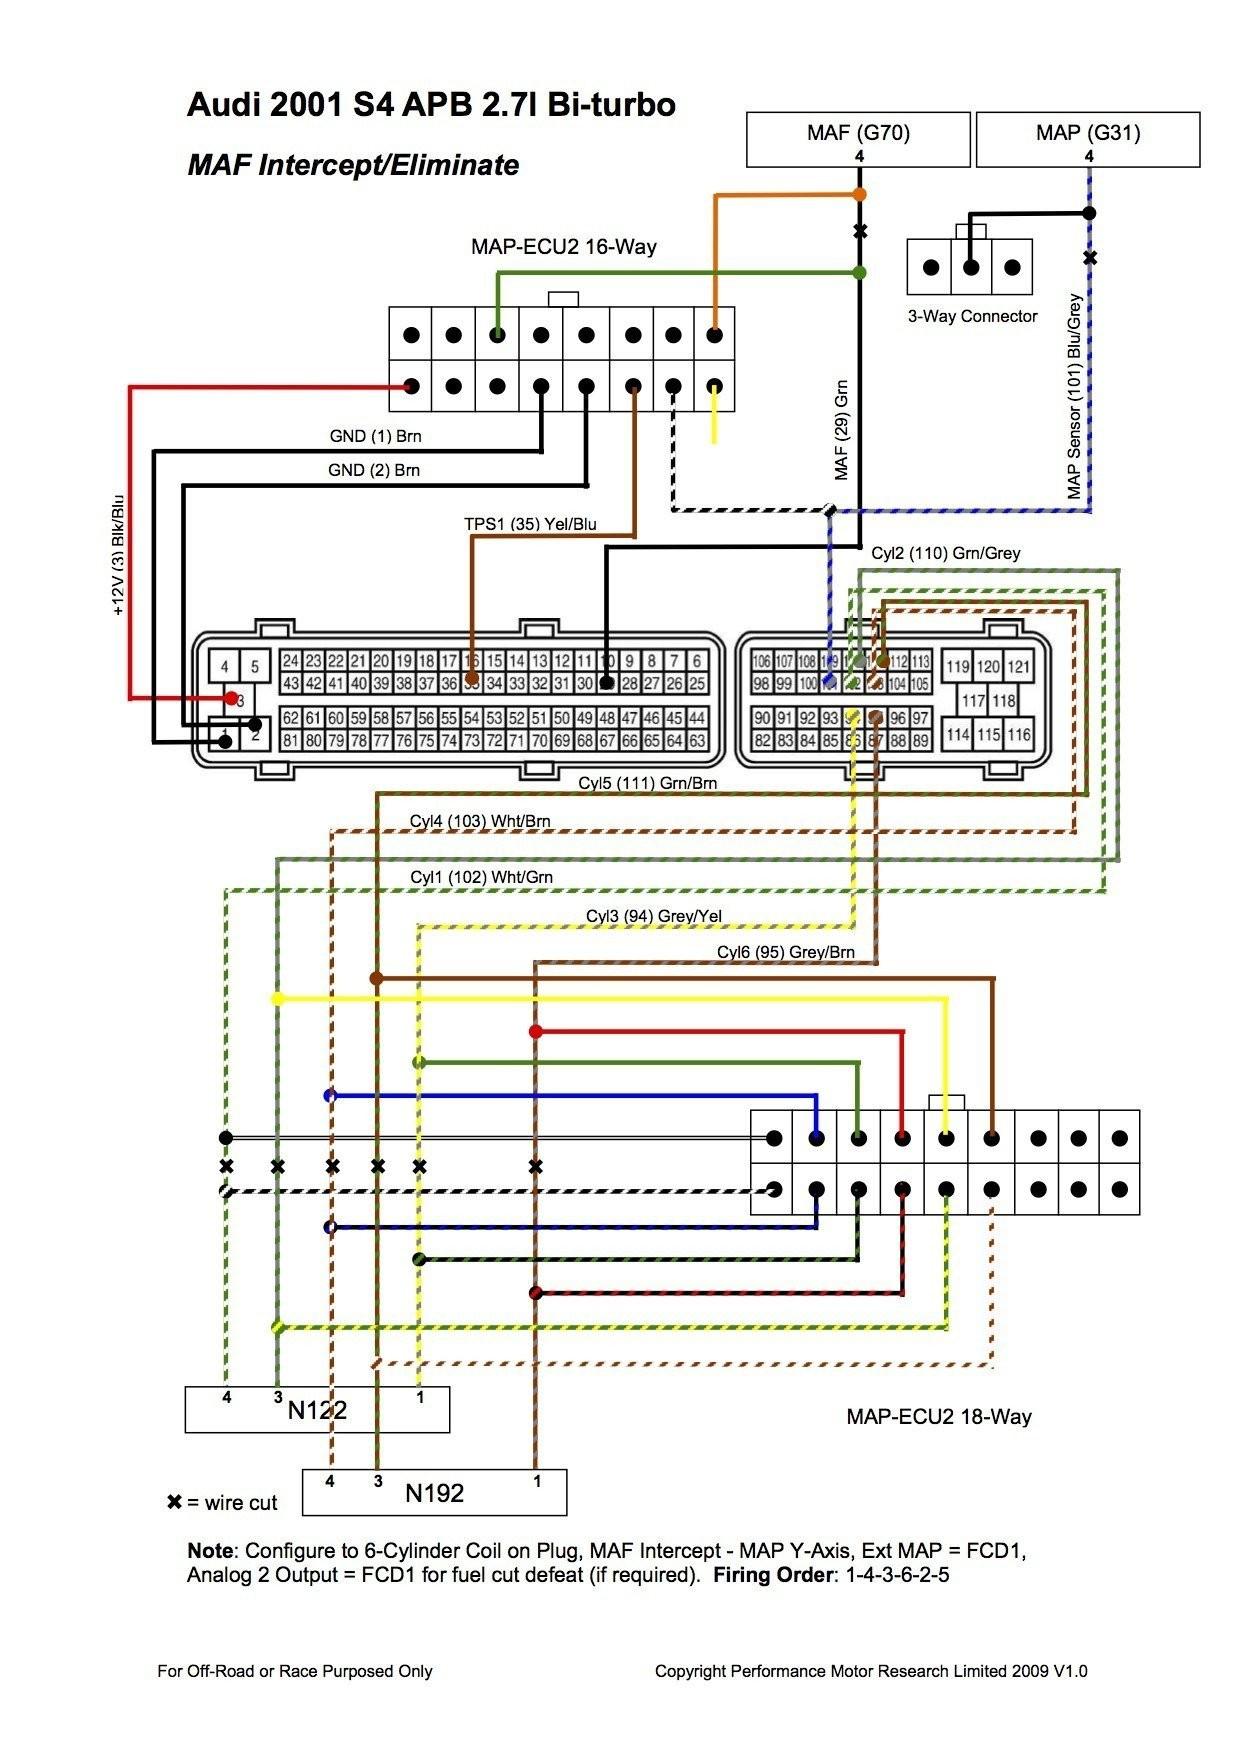 Tremendous Audi A4 B8 Headlight Wiring Diagram Unique Audi A4 Wiring Diagram 16 Wiring Cloud Intelaidewilluminateatxorg